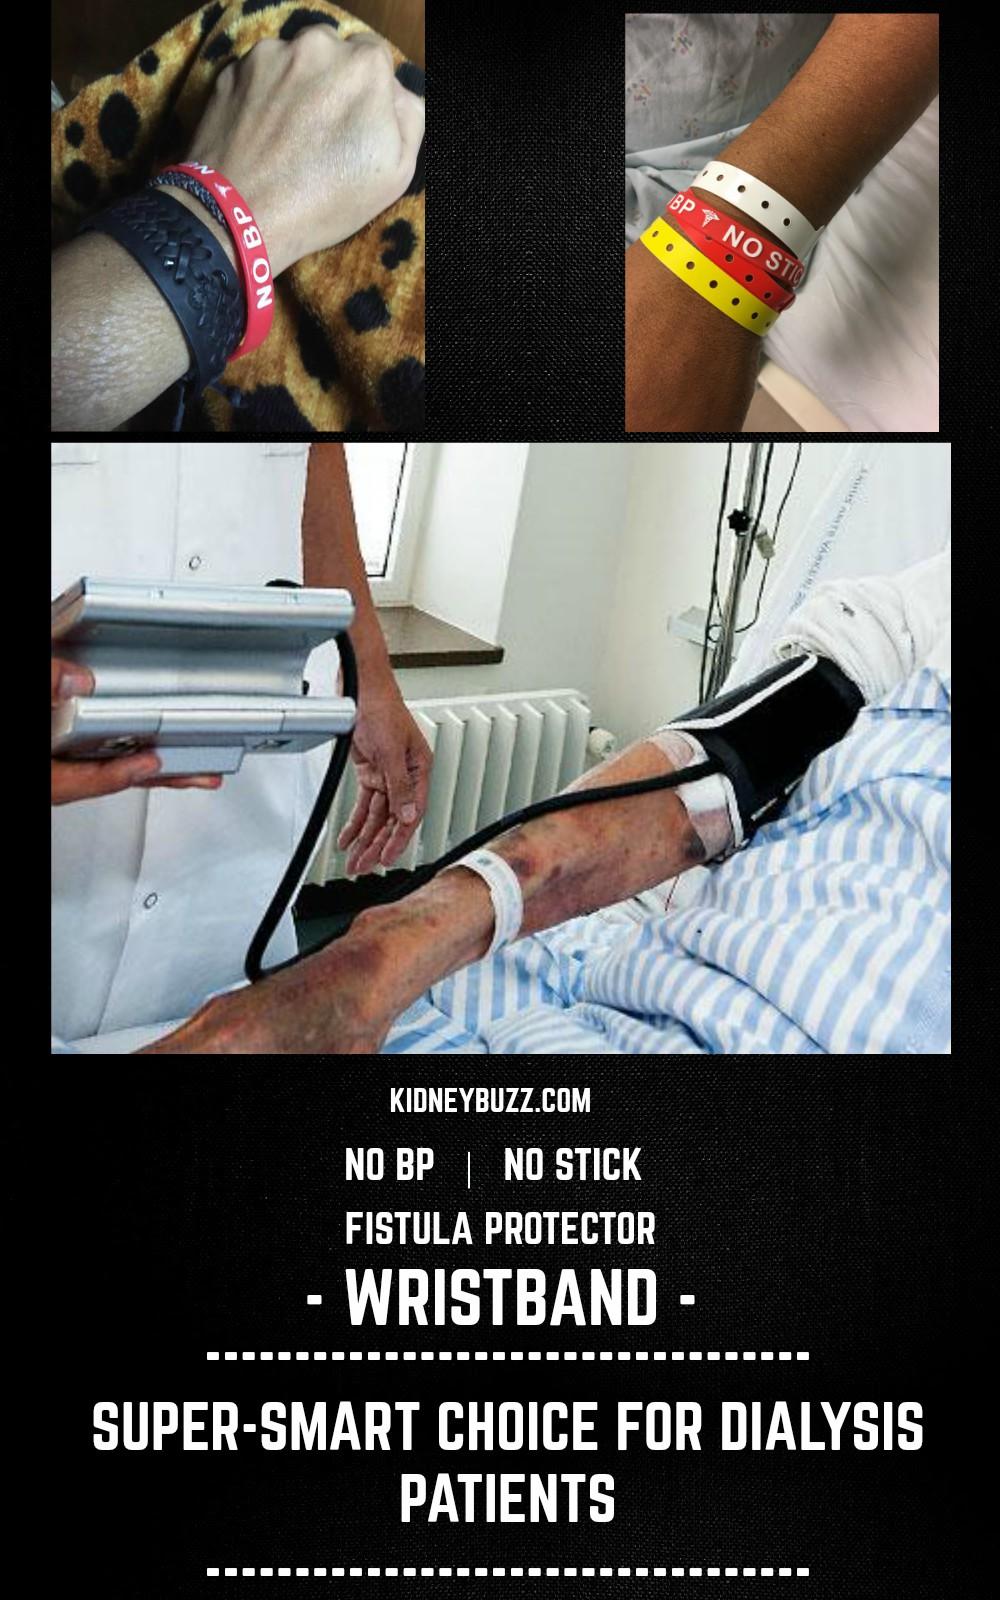 Fistula Protector Wristband Banner New III.jpg